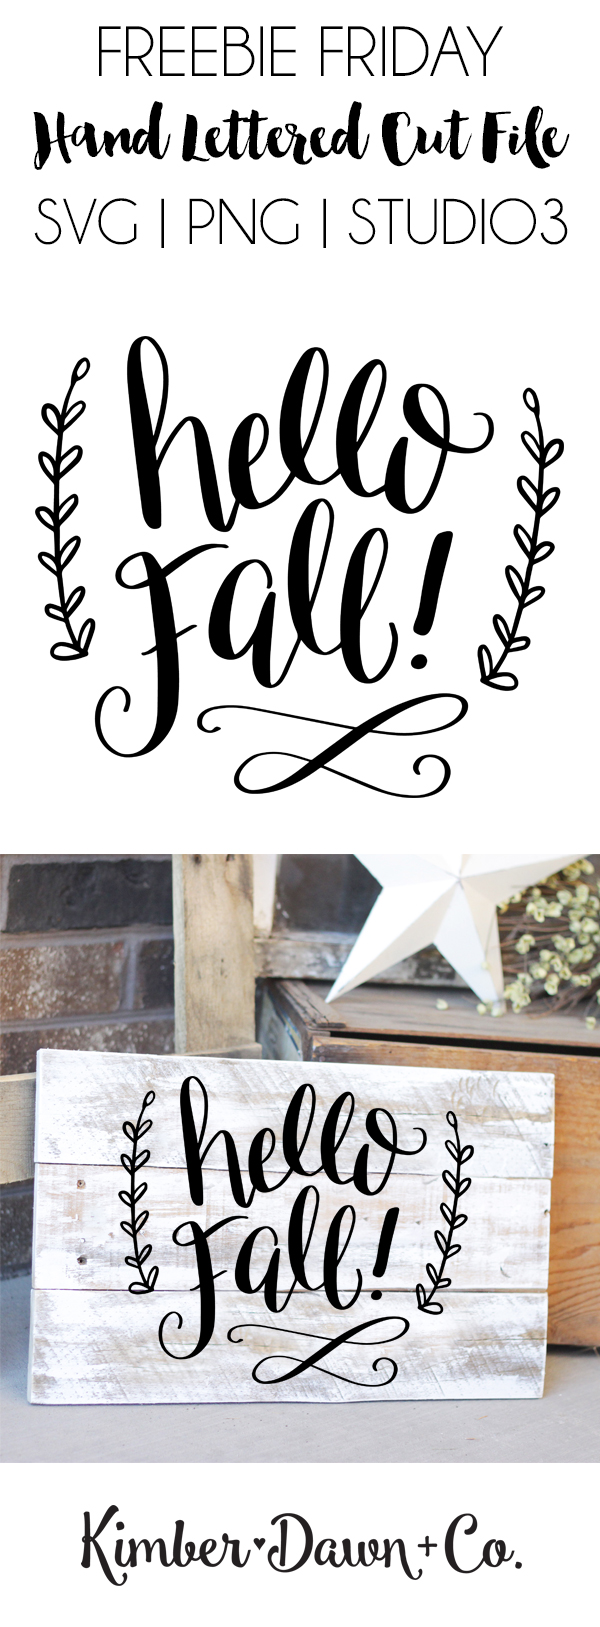 Freebie Friday! Hand Lettered Hello Fall Free SVG Cut File (PNG, Studio3) | DawnNicoleDesigns.com